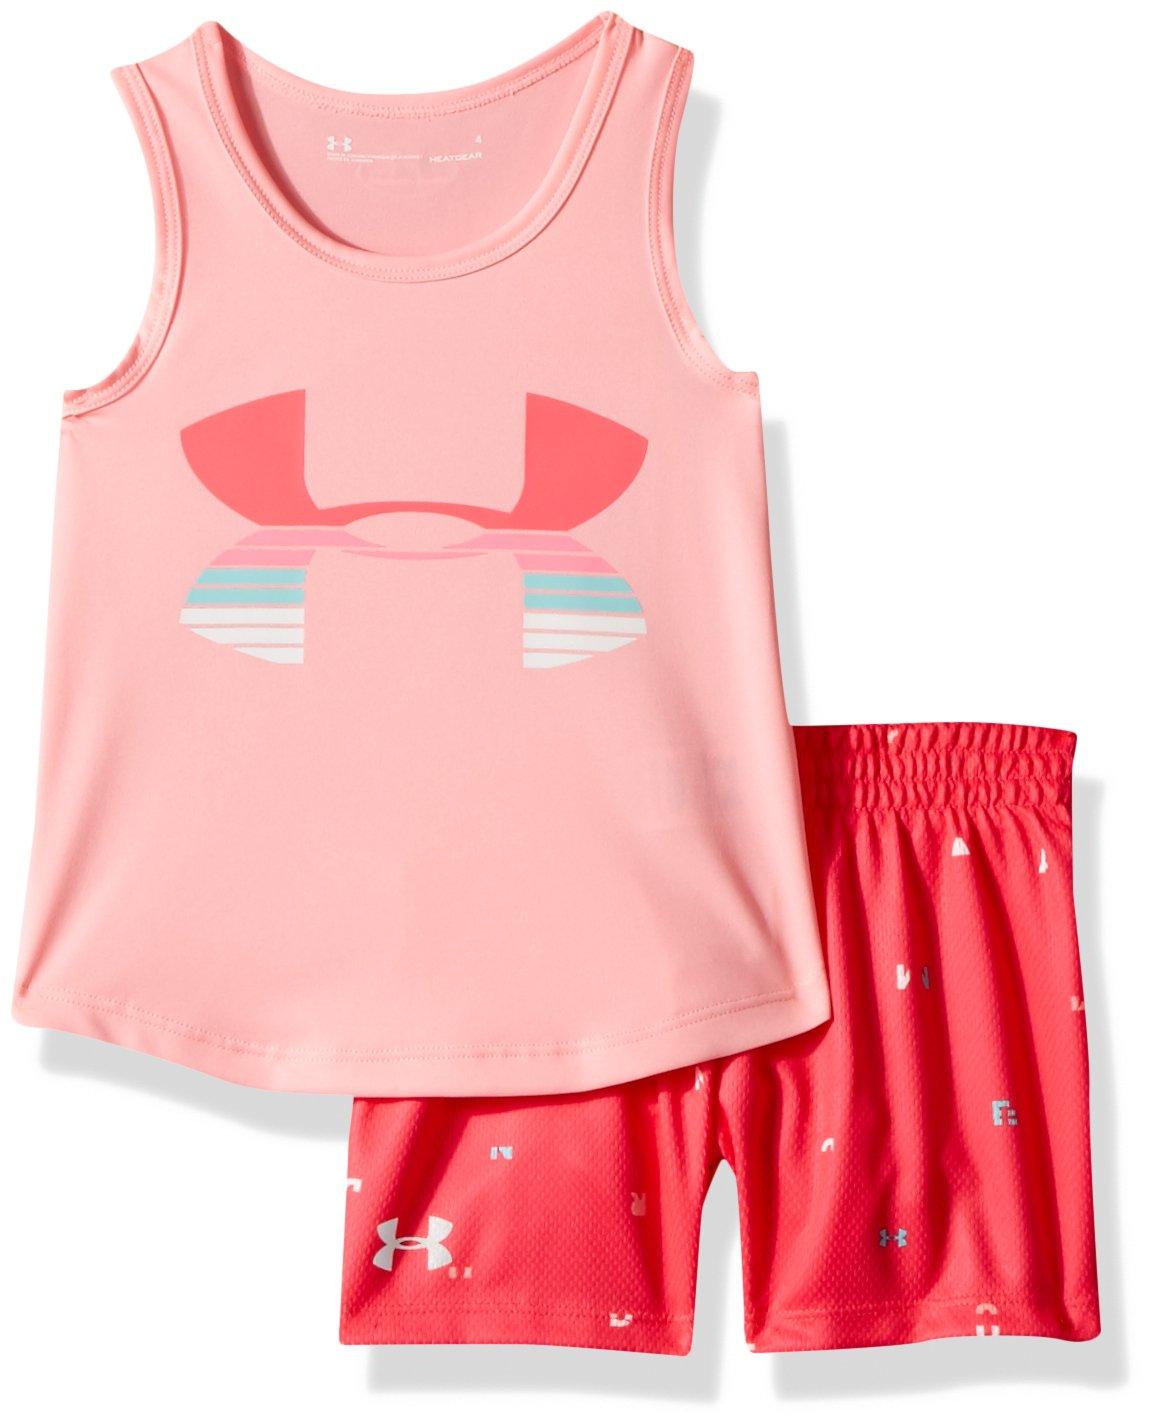 Under Armour Toddler Girls' UA Tank and Short Set, Pop Pink, 3T